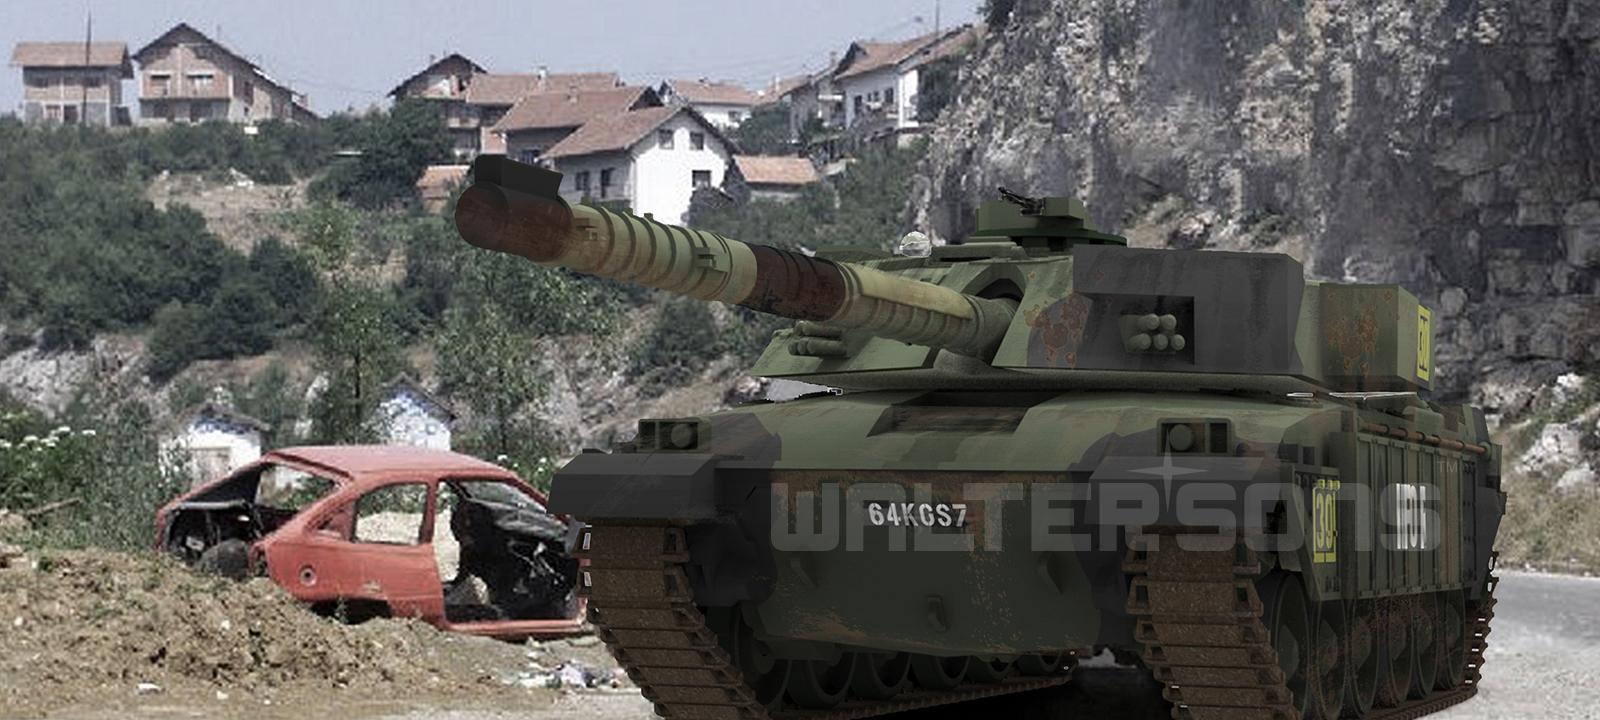 RC tank Waltersons British Challenger 1 NATO